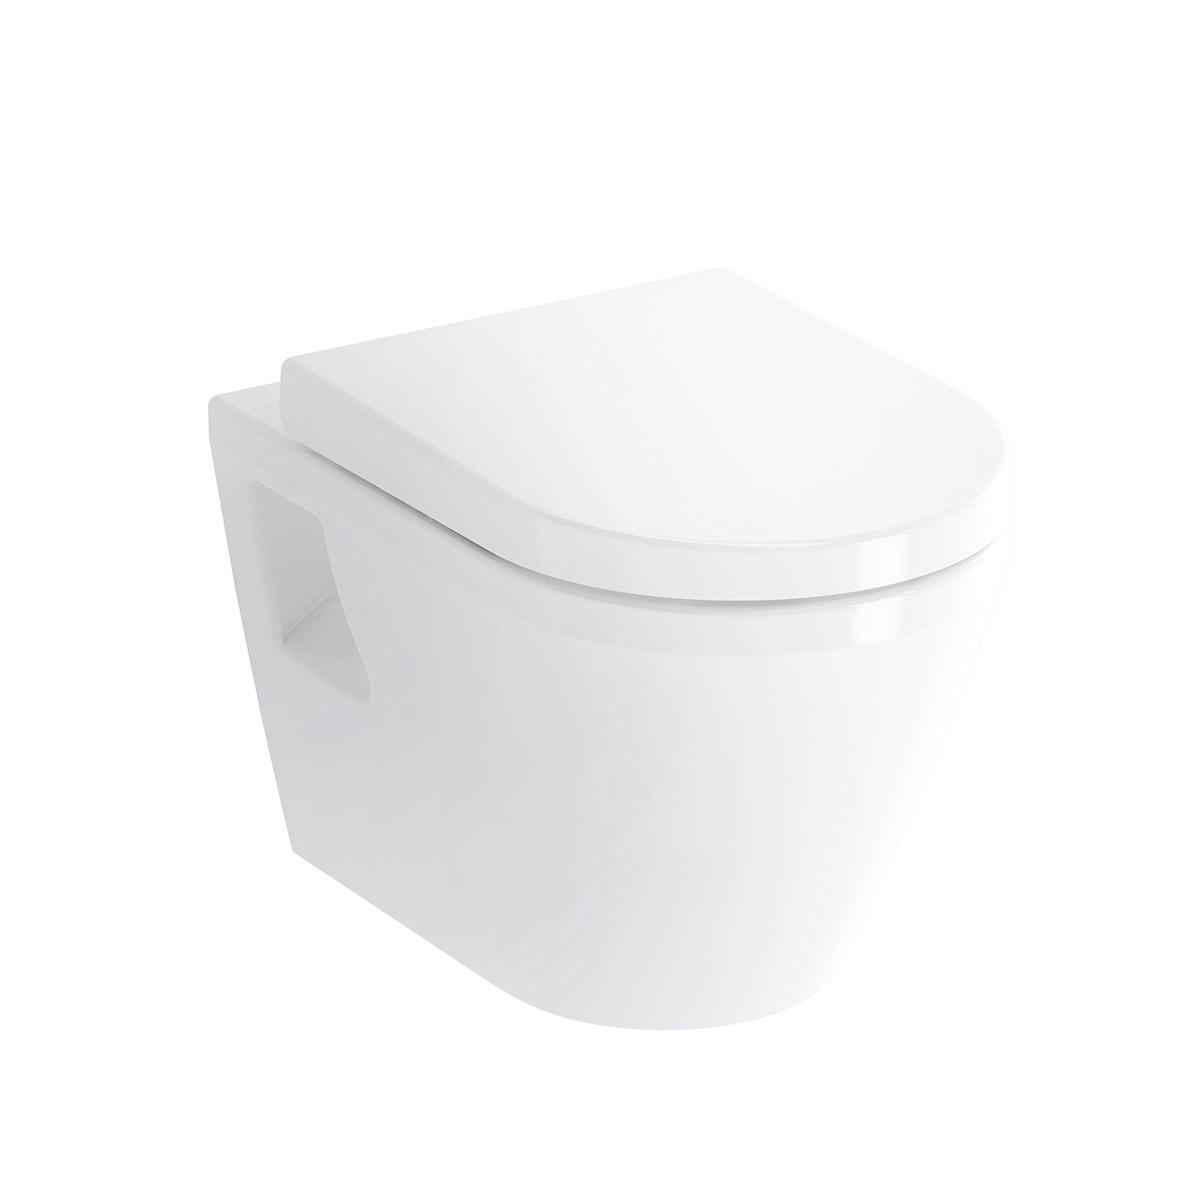 Integra Wand-WC Flachspüler mit Bidetfunktion, Weiß